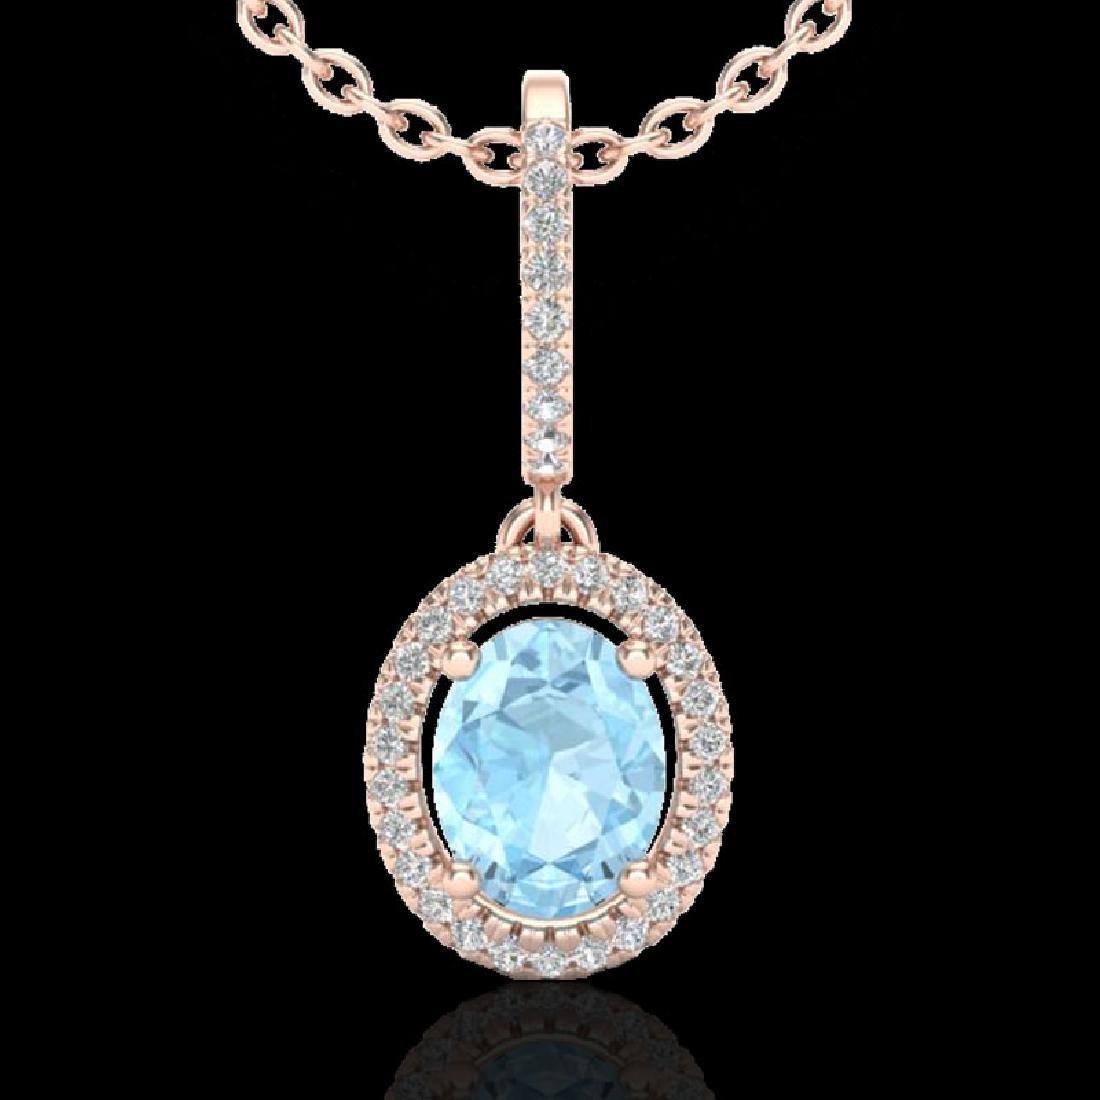 1.75 CTW Aquamarine & Micro VS/SI Diamond Necklace Halo